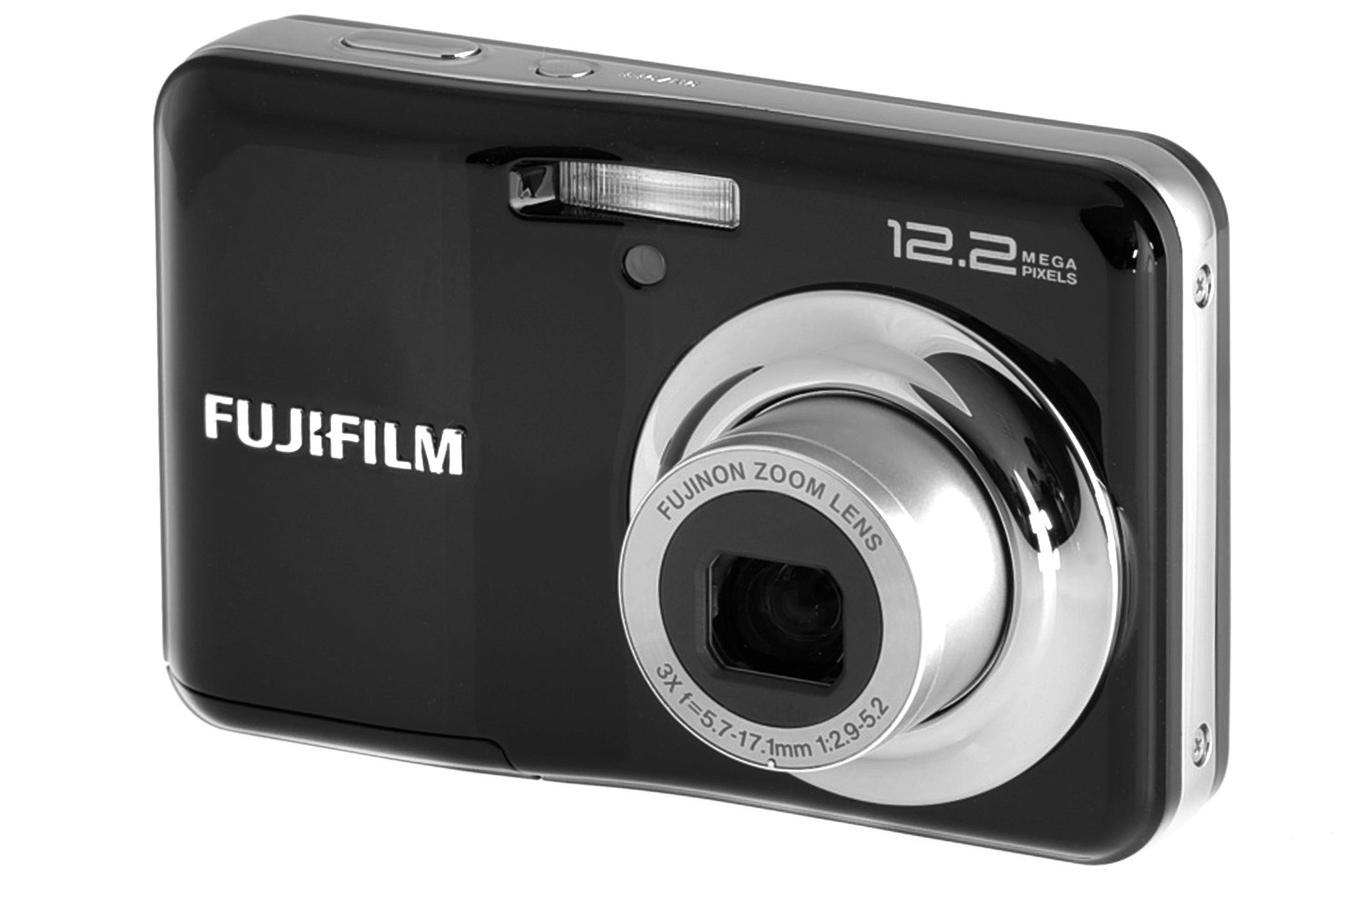 Appareil photo compact fujifilm a220 noir 1581902 darty for Appareil photo fujifilm darty